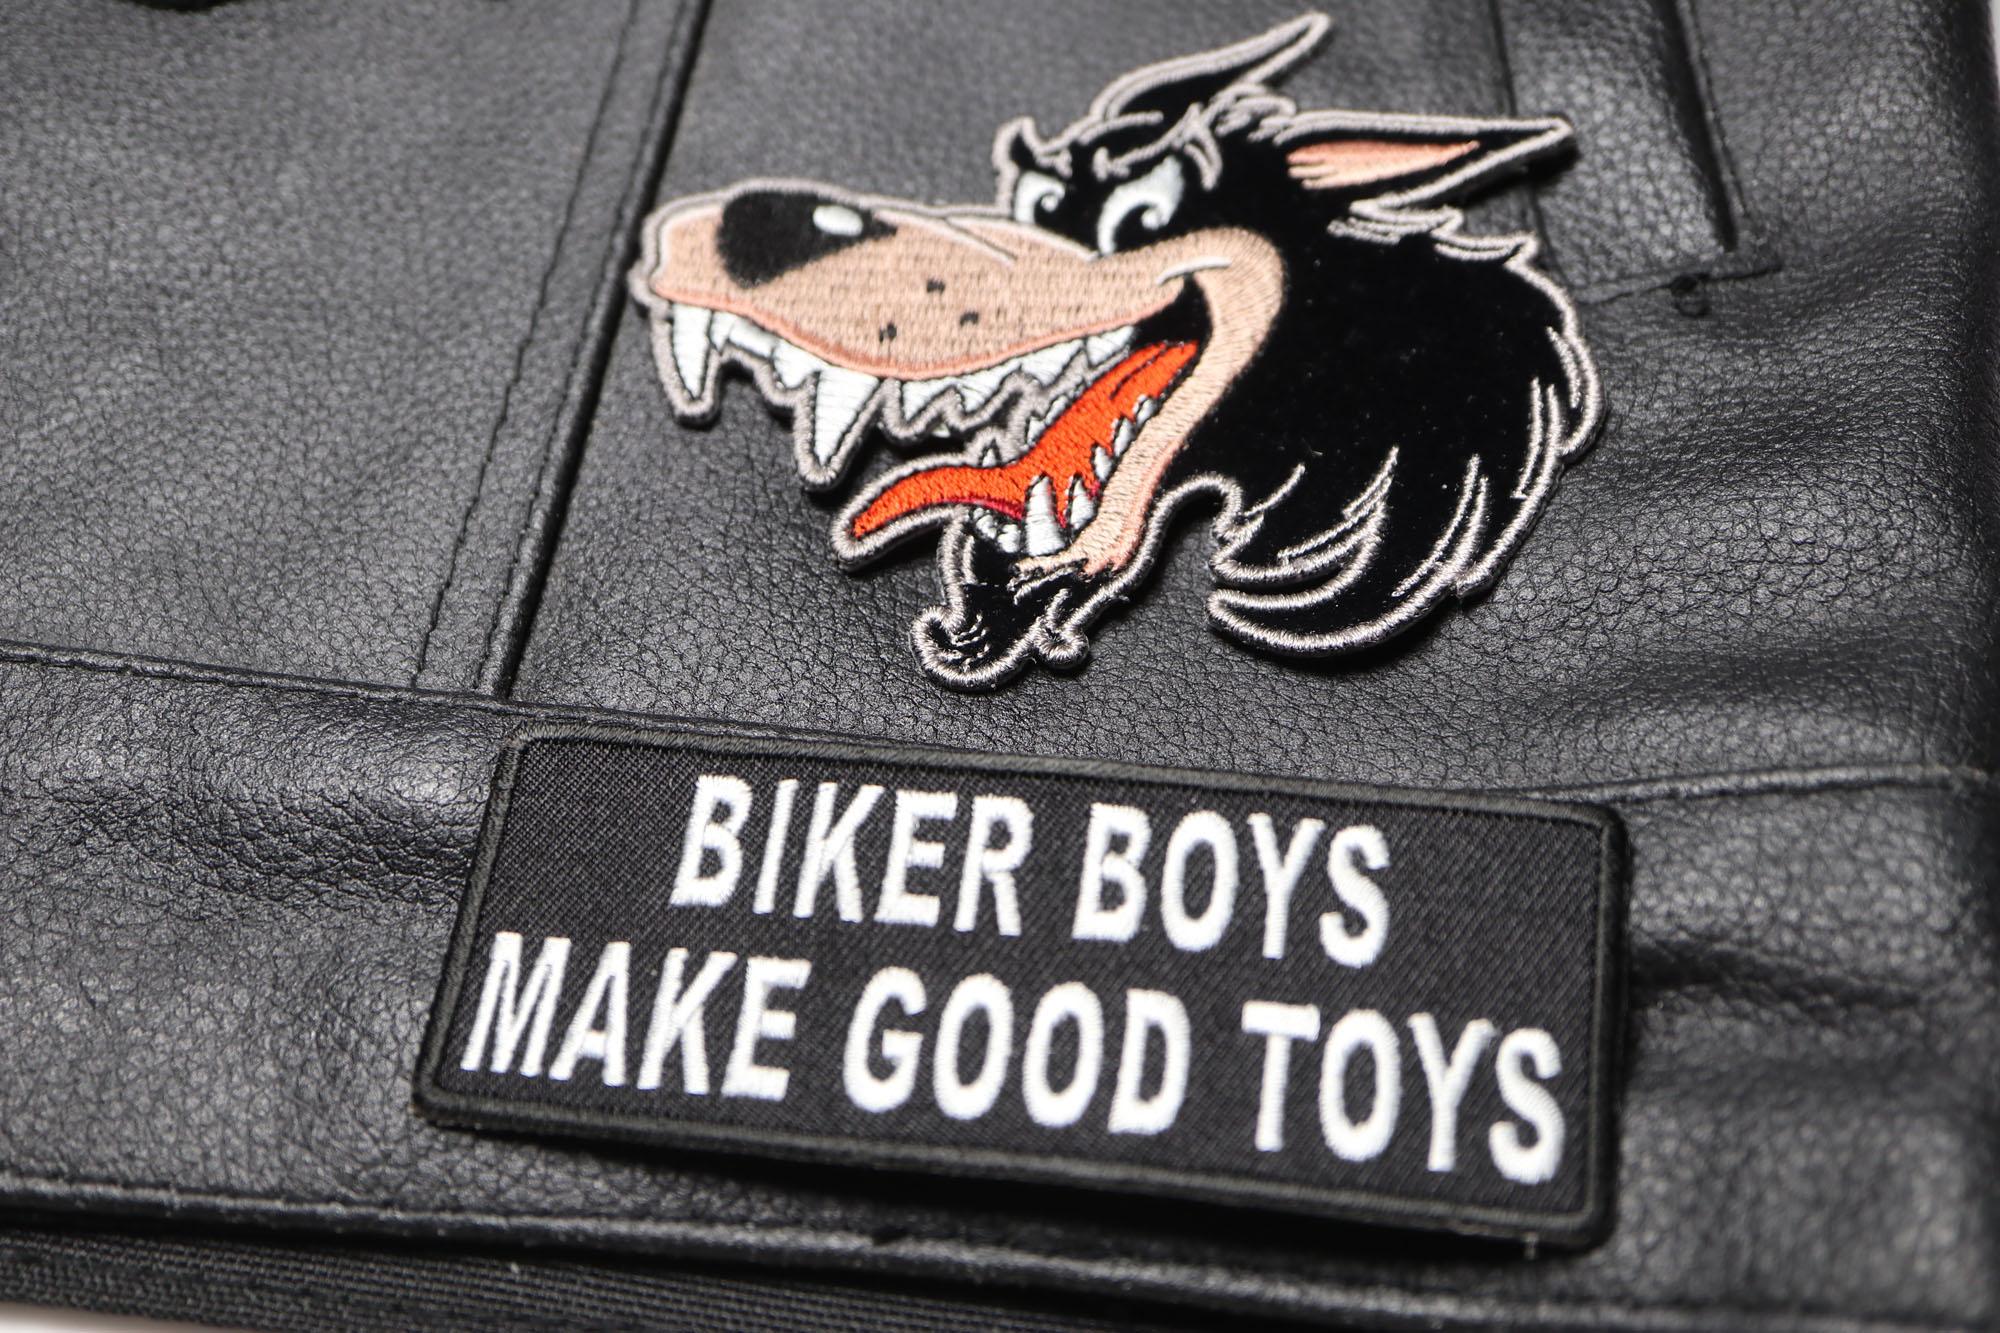 431baa636b08 Biker Patch Guide | Outlaw Biker Patches | Biker Patch Rules ...